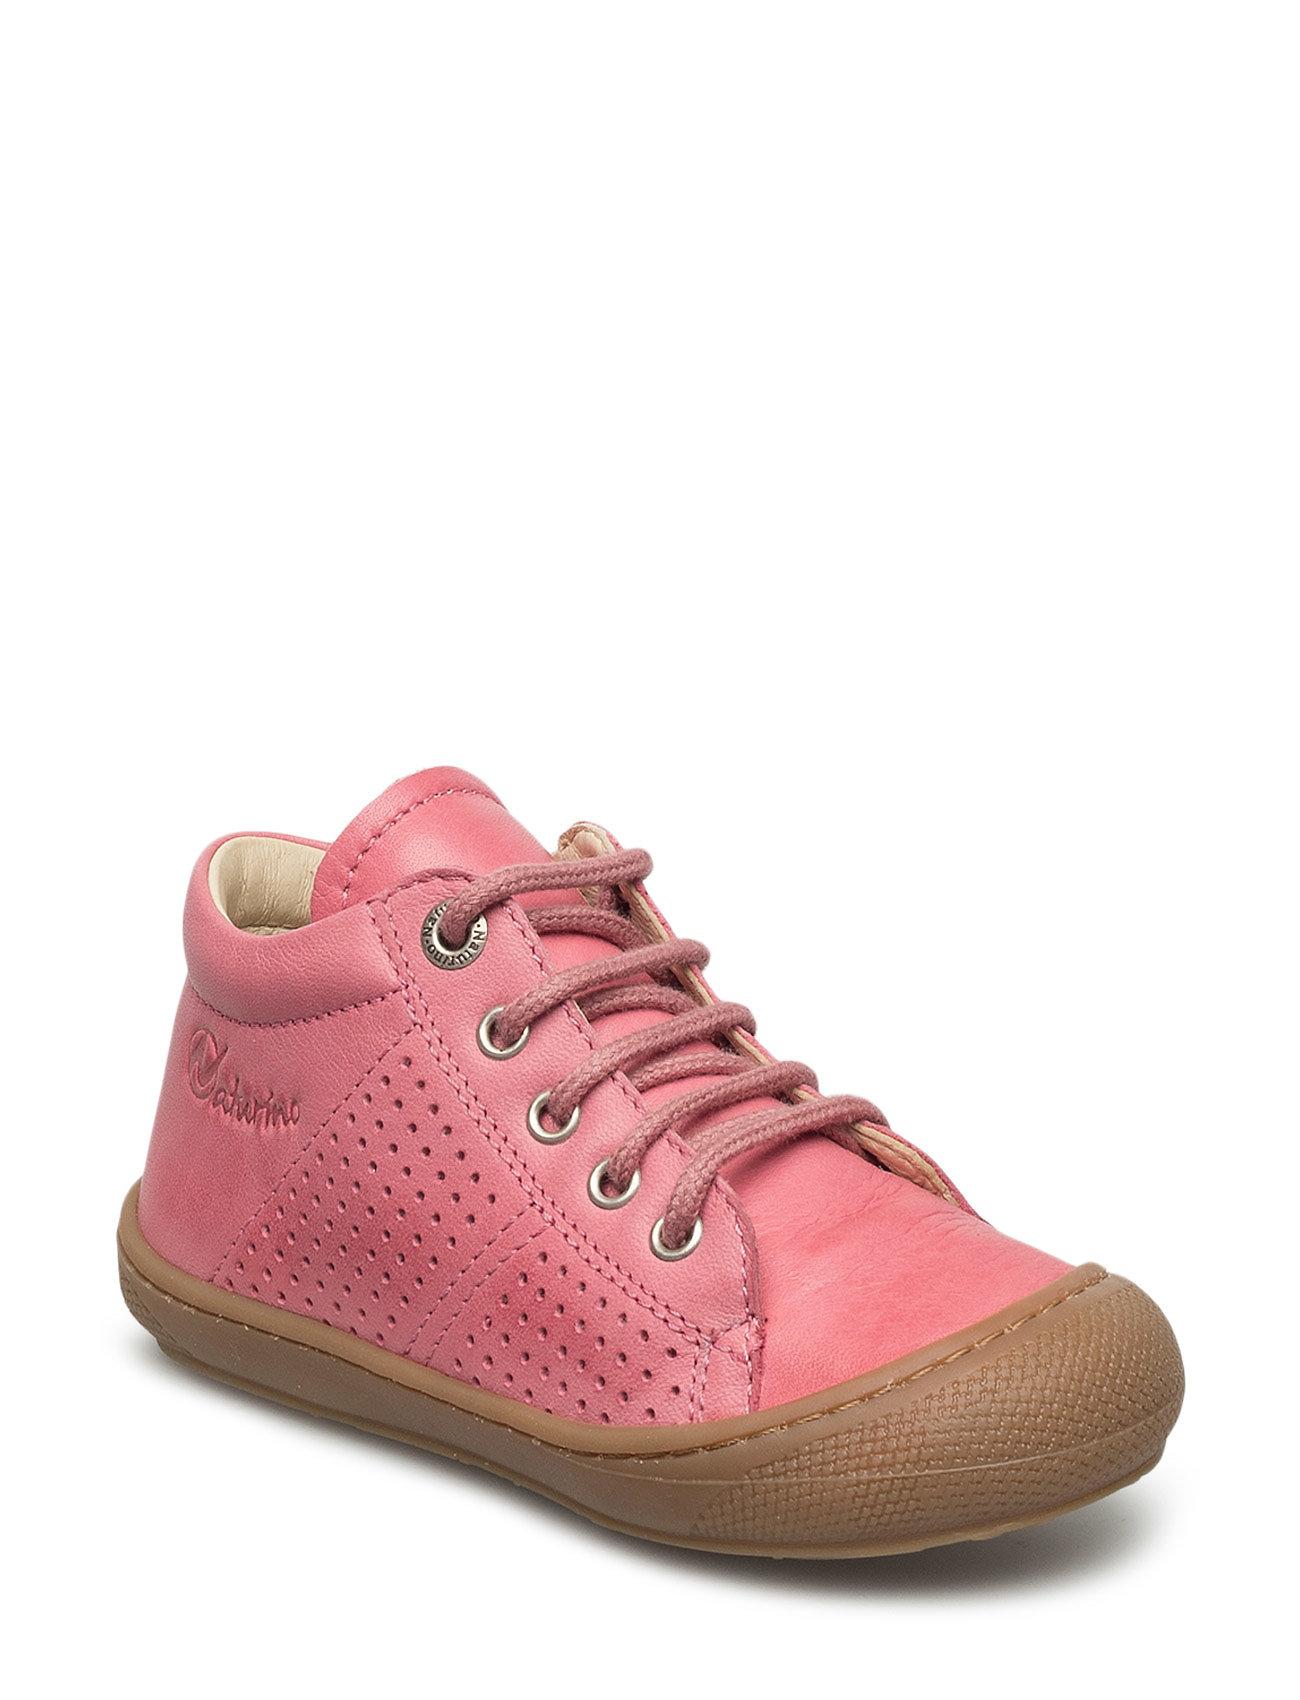 Naturino 4407 Naturino Sko & Sneakers til Børn i Beige